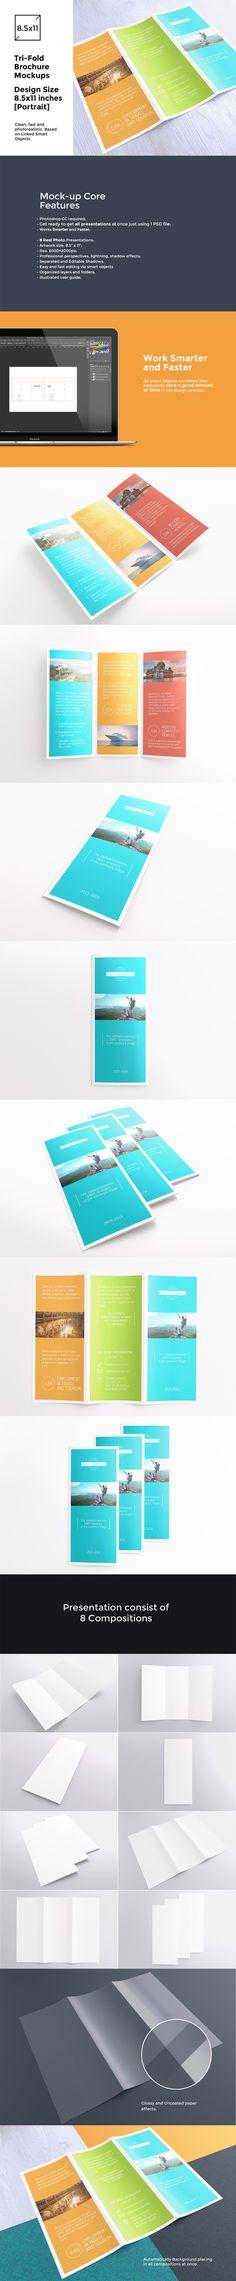 Tri-Fold Brochure / Flyer Mock-up's by itembridge creative store on @creativemarket